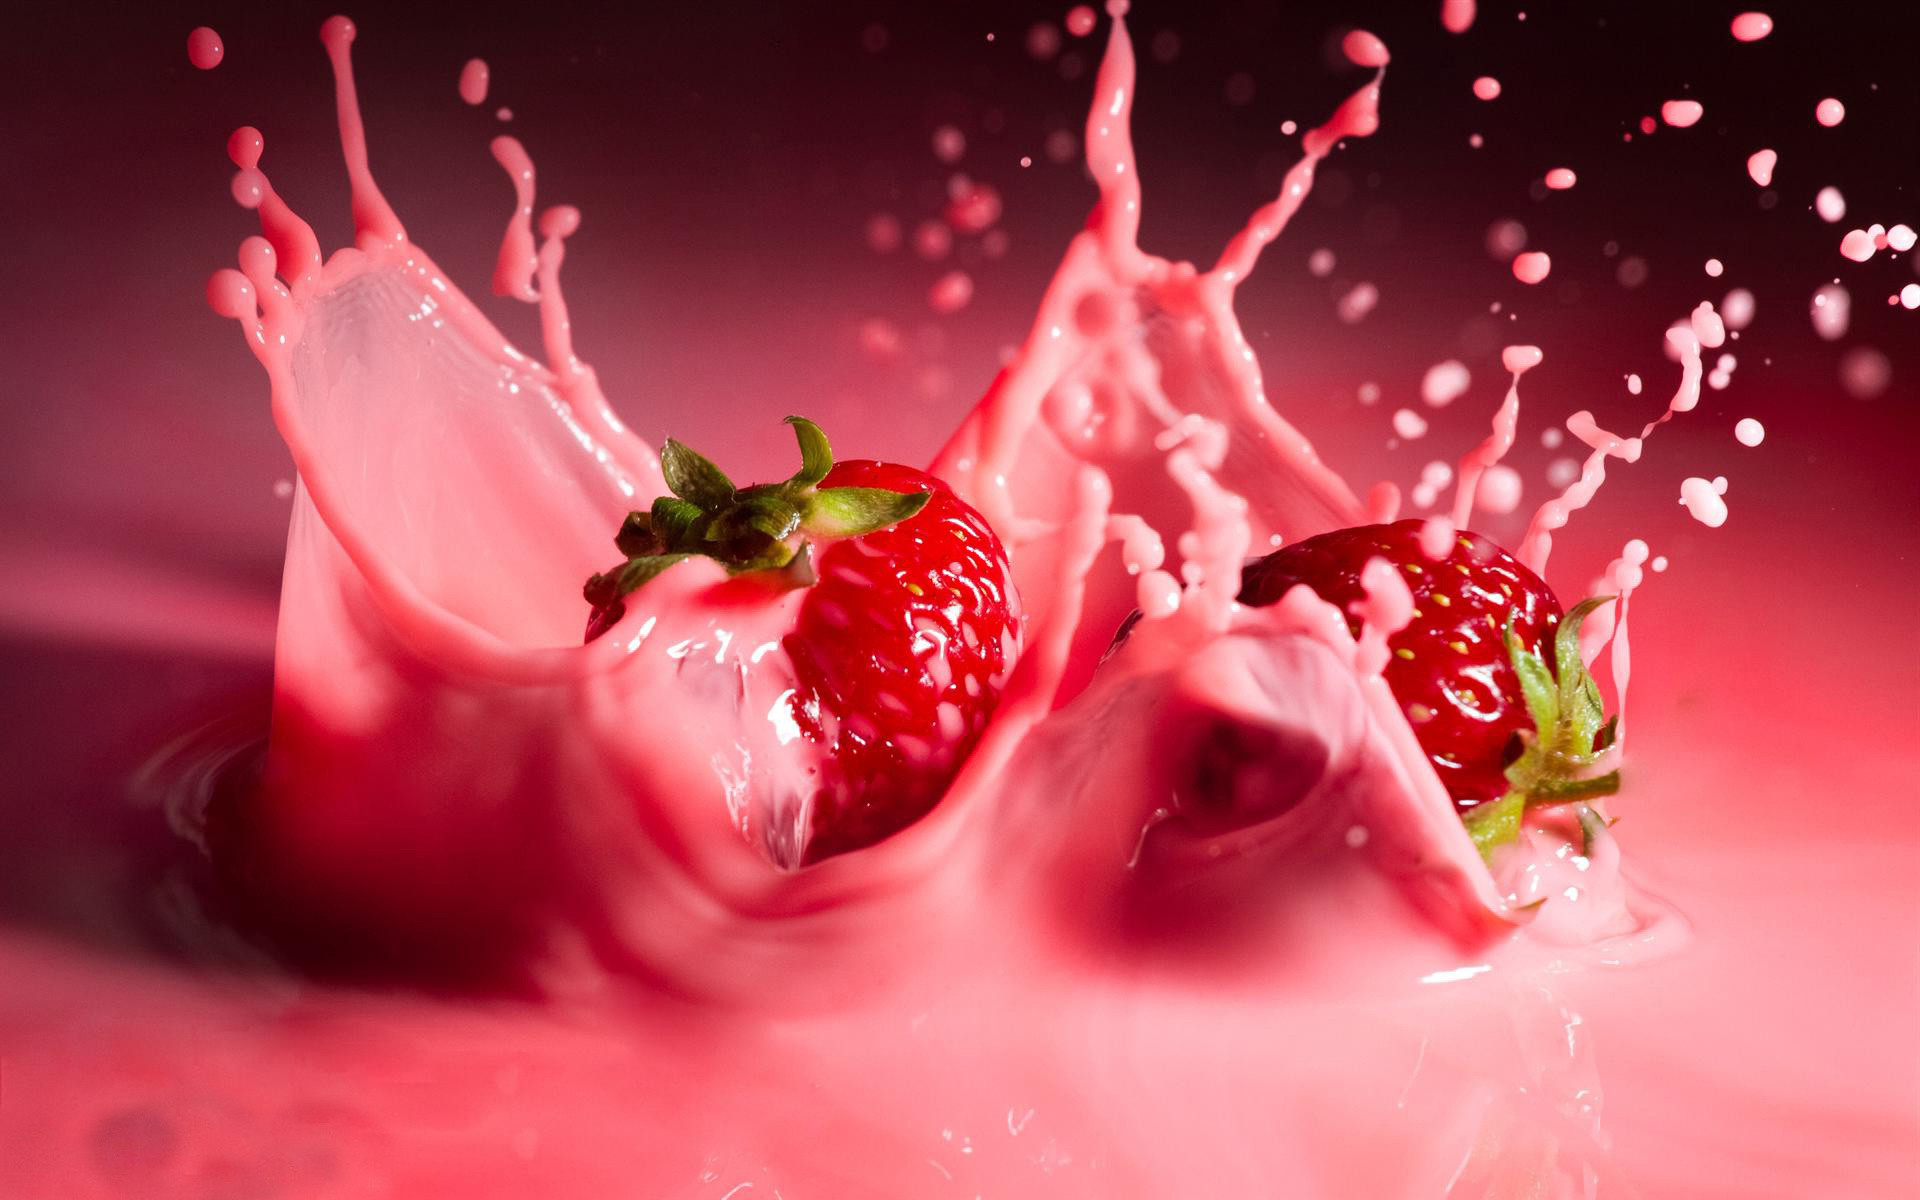 fruits 3D HD   3D Strowberry Fruits Milkshake Photography Wallpaper HD Photo